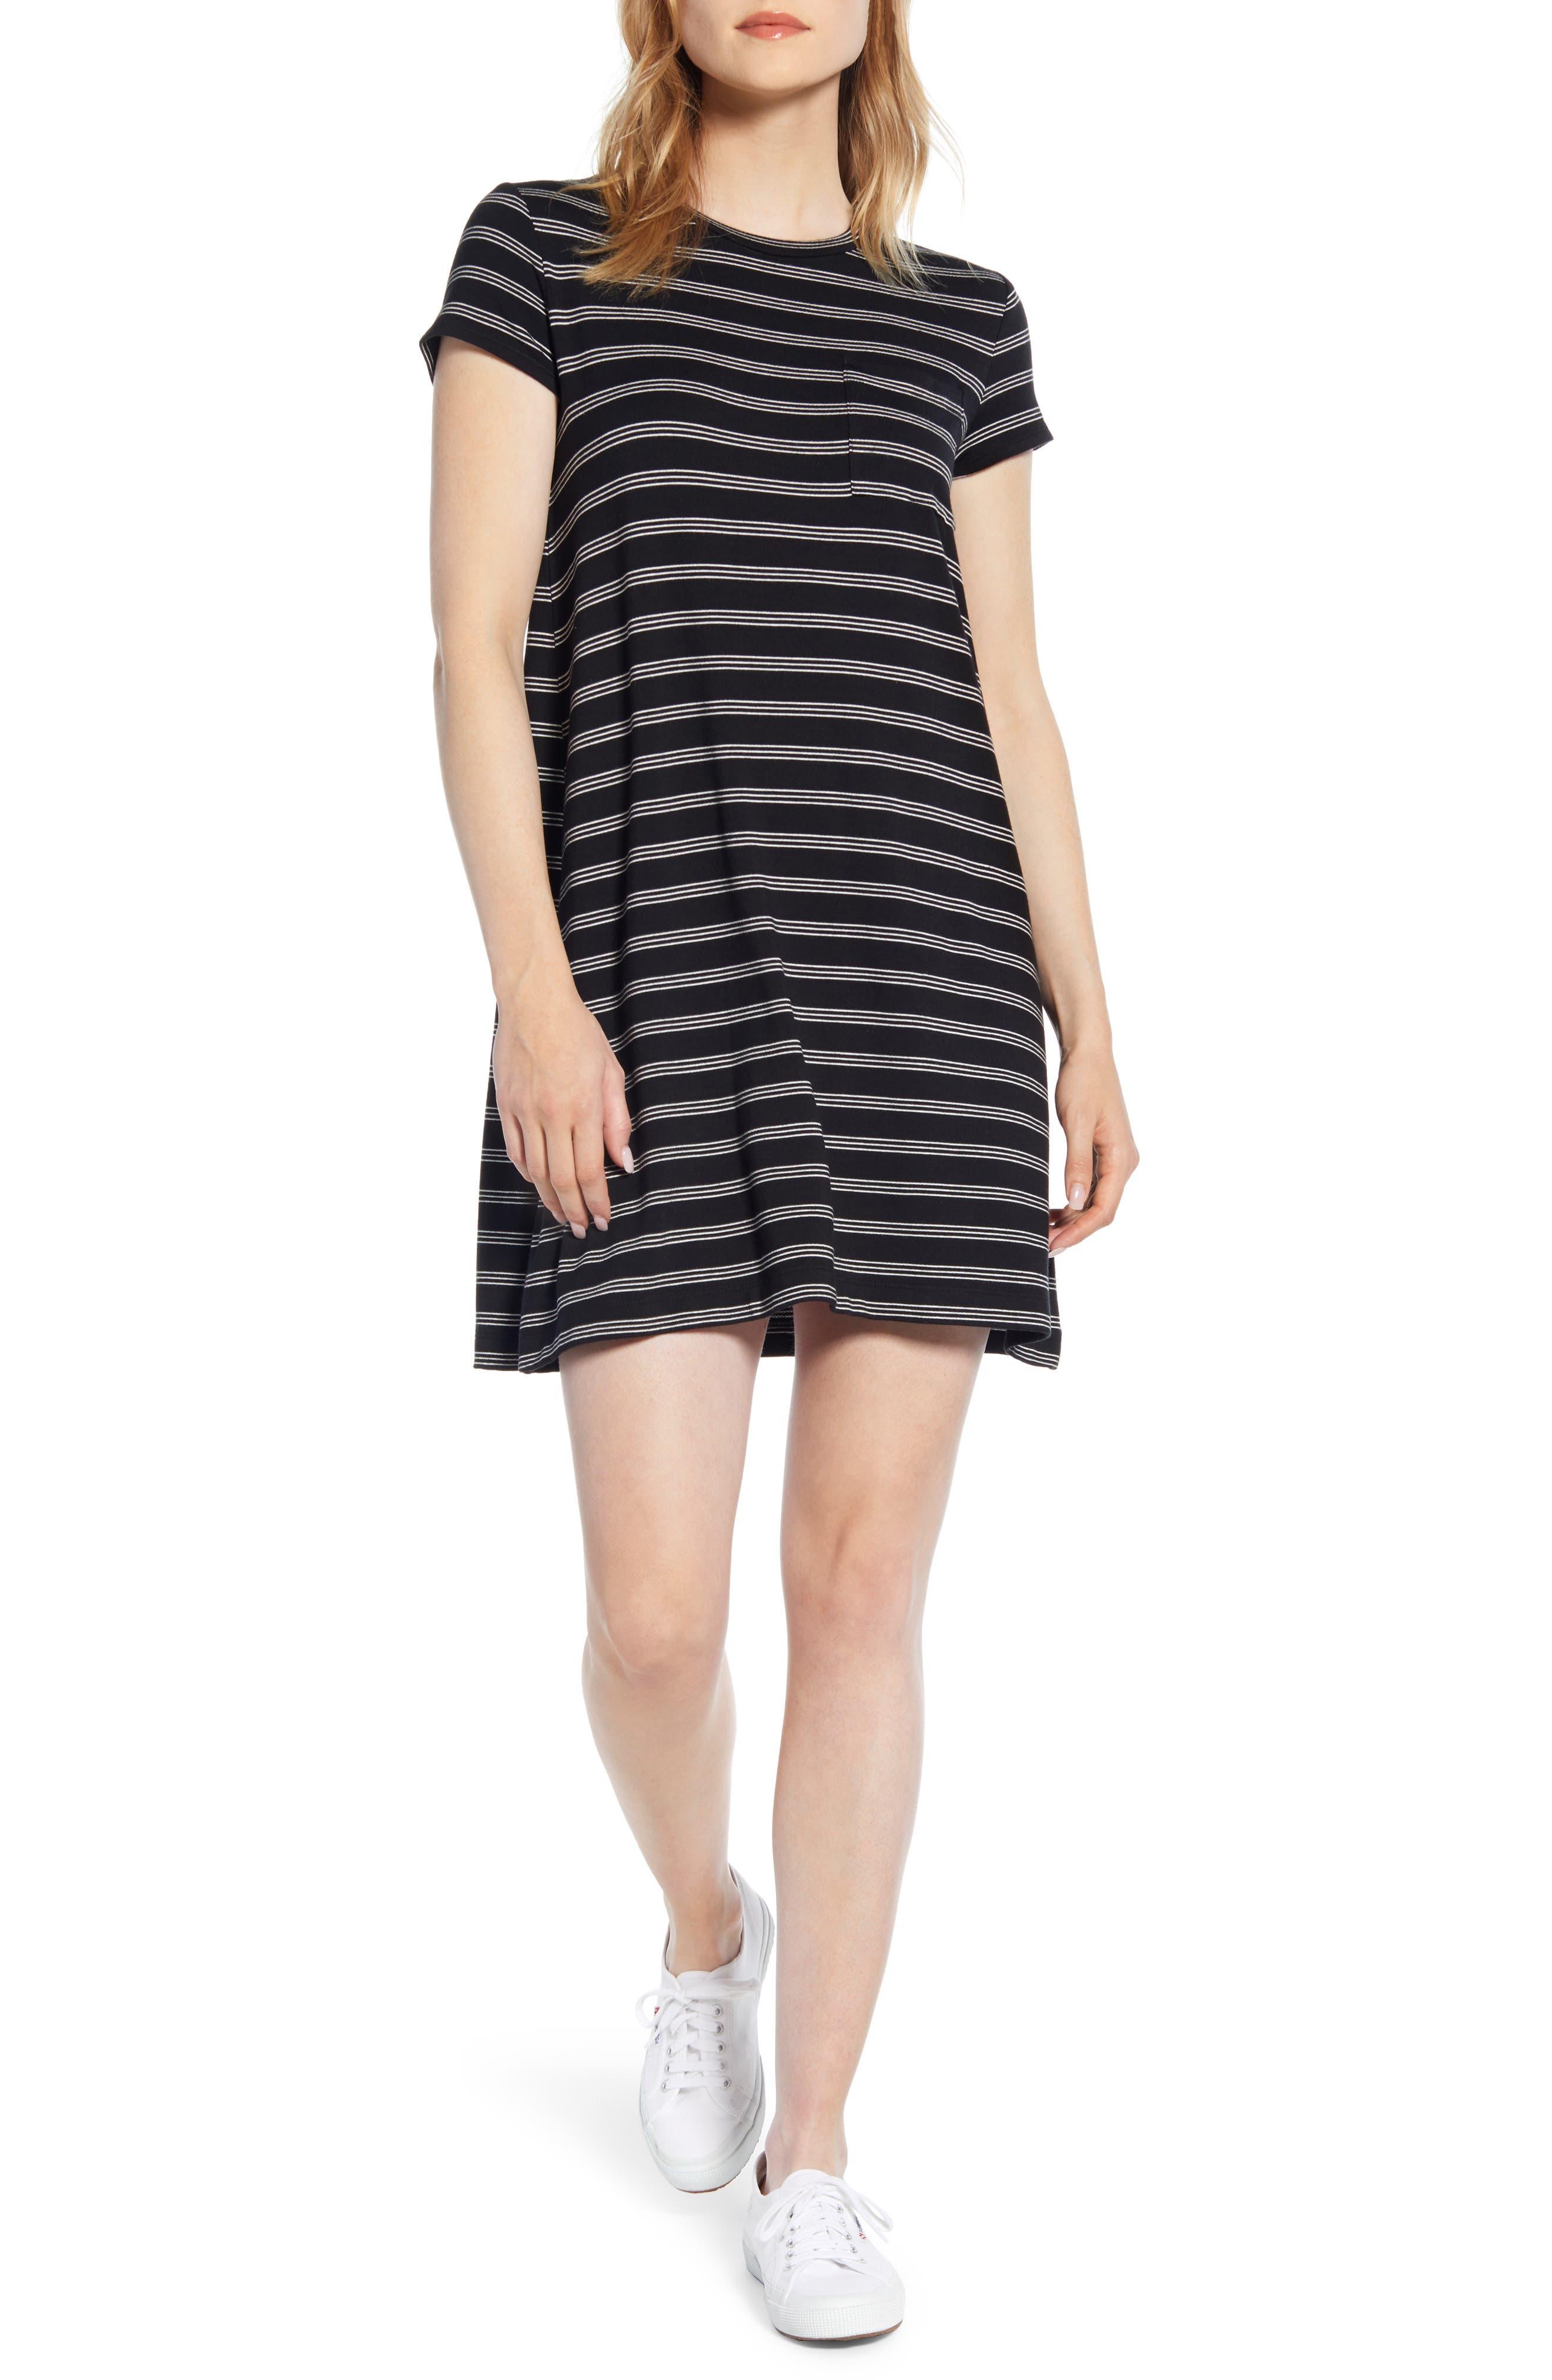 Lou & Grey Stripe Signaturesoft Pocket Tee Dress, Black